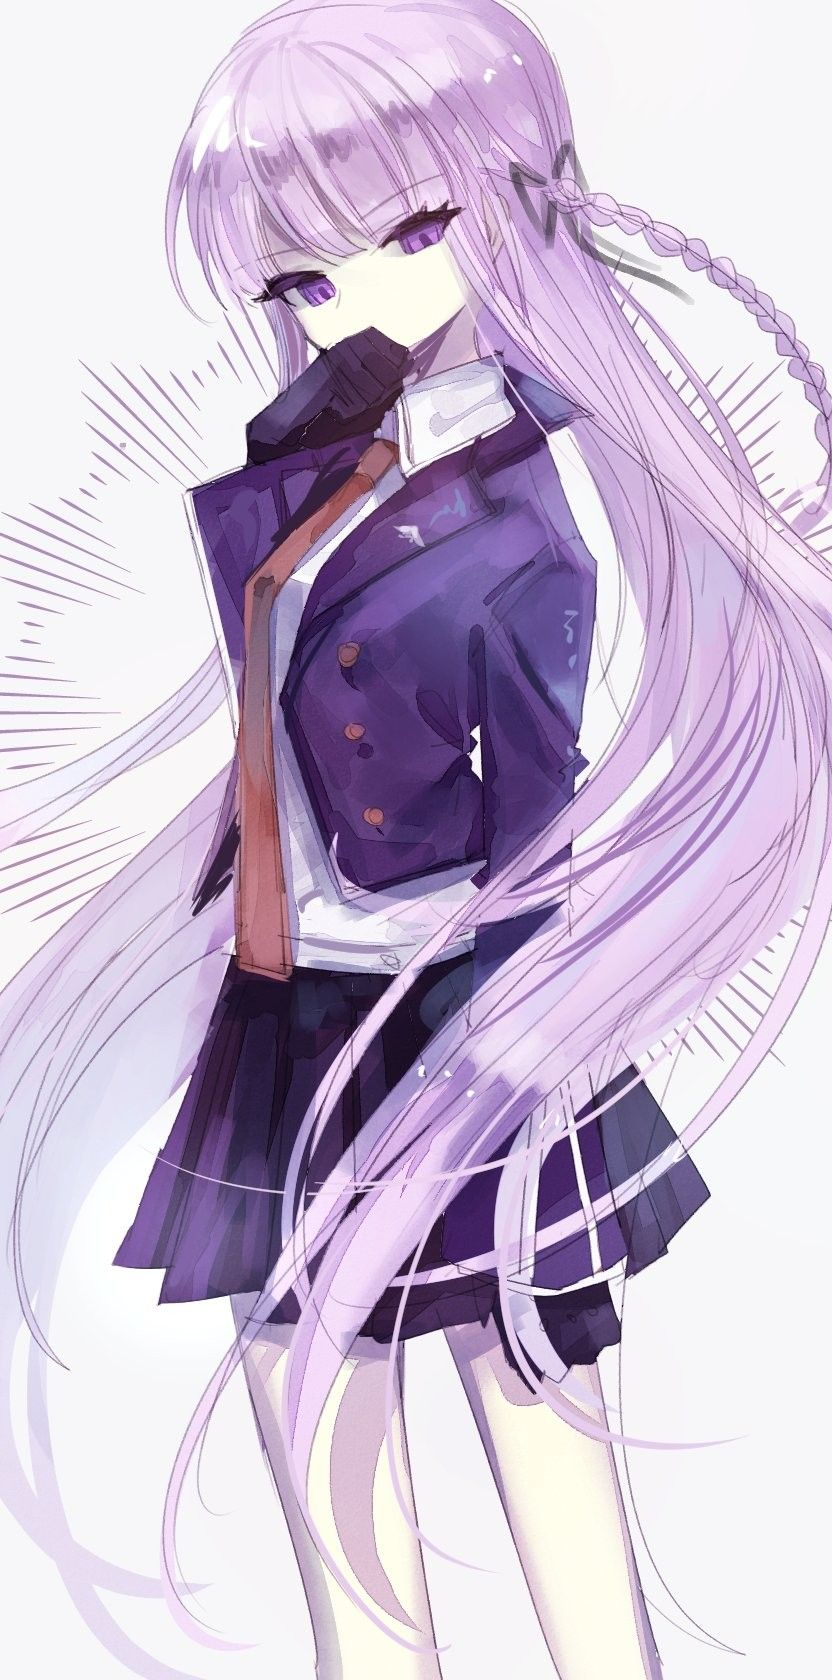 Kyoko Kirigiri by 37_v3 Персонажи аниме, Аниме